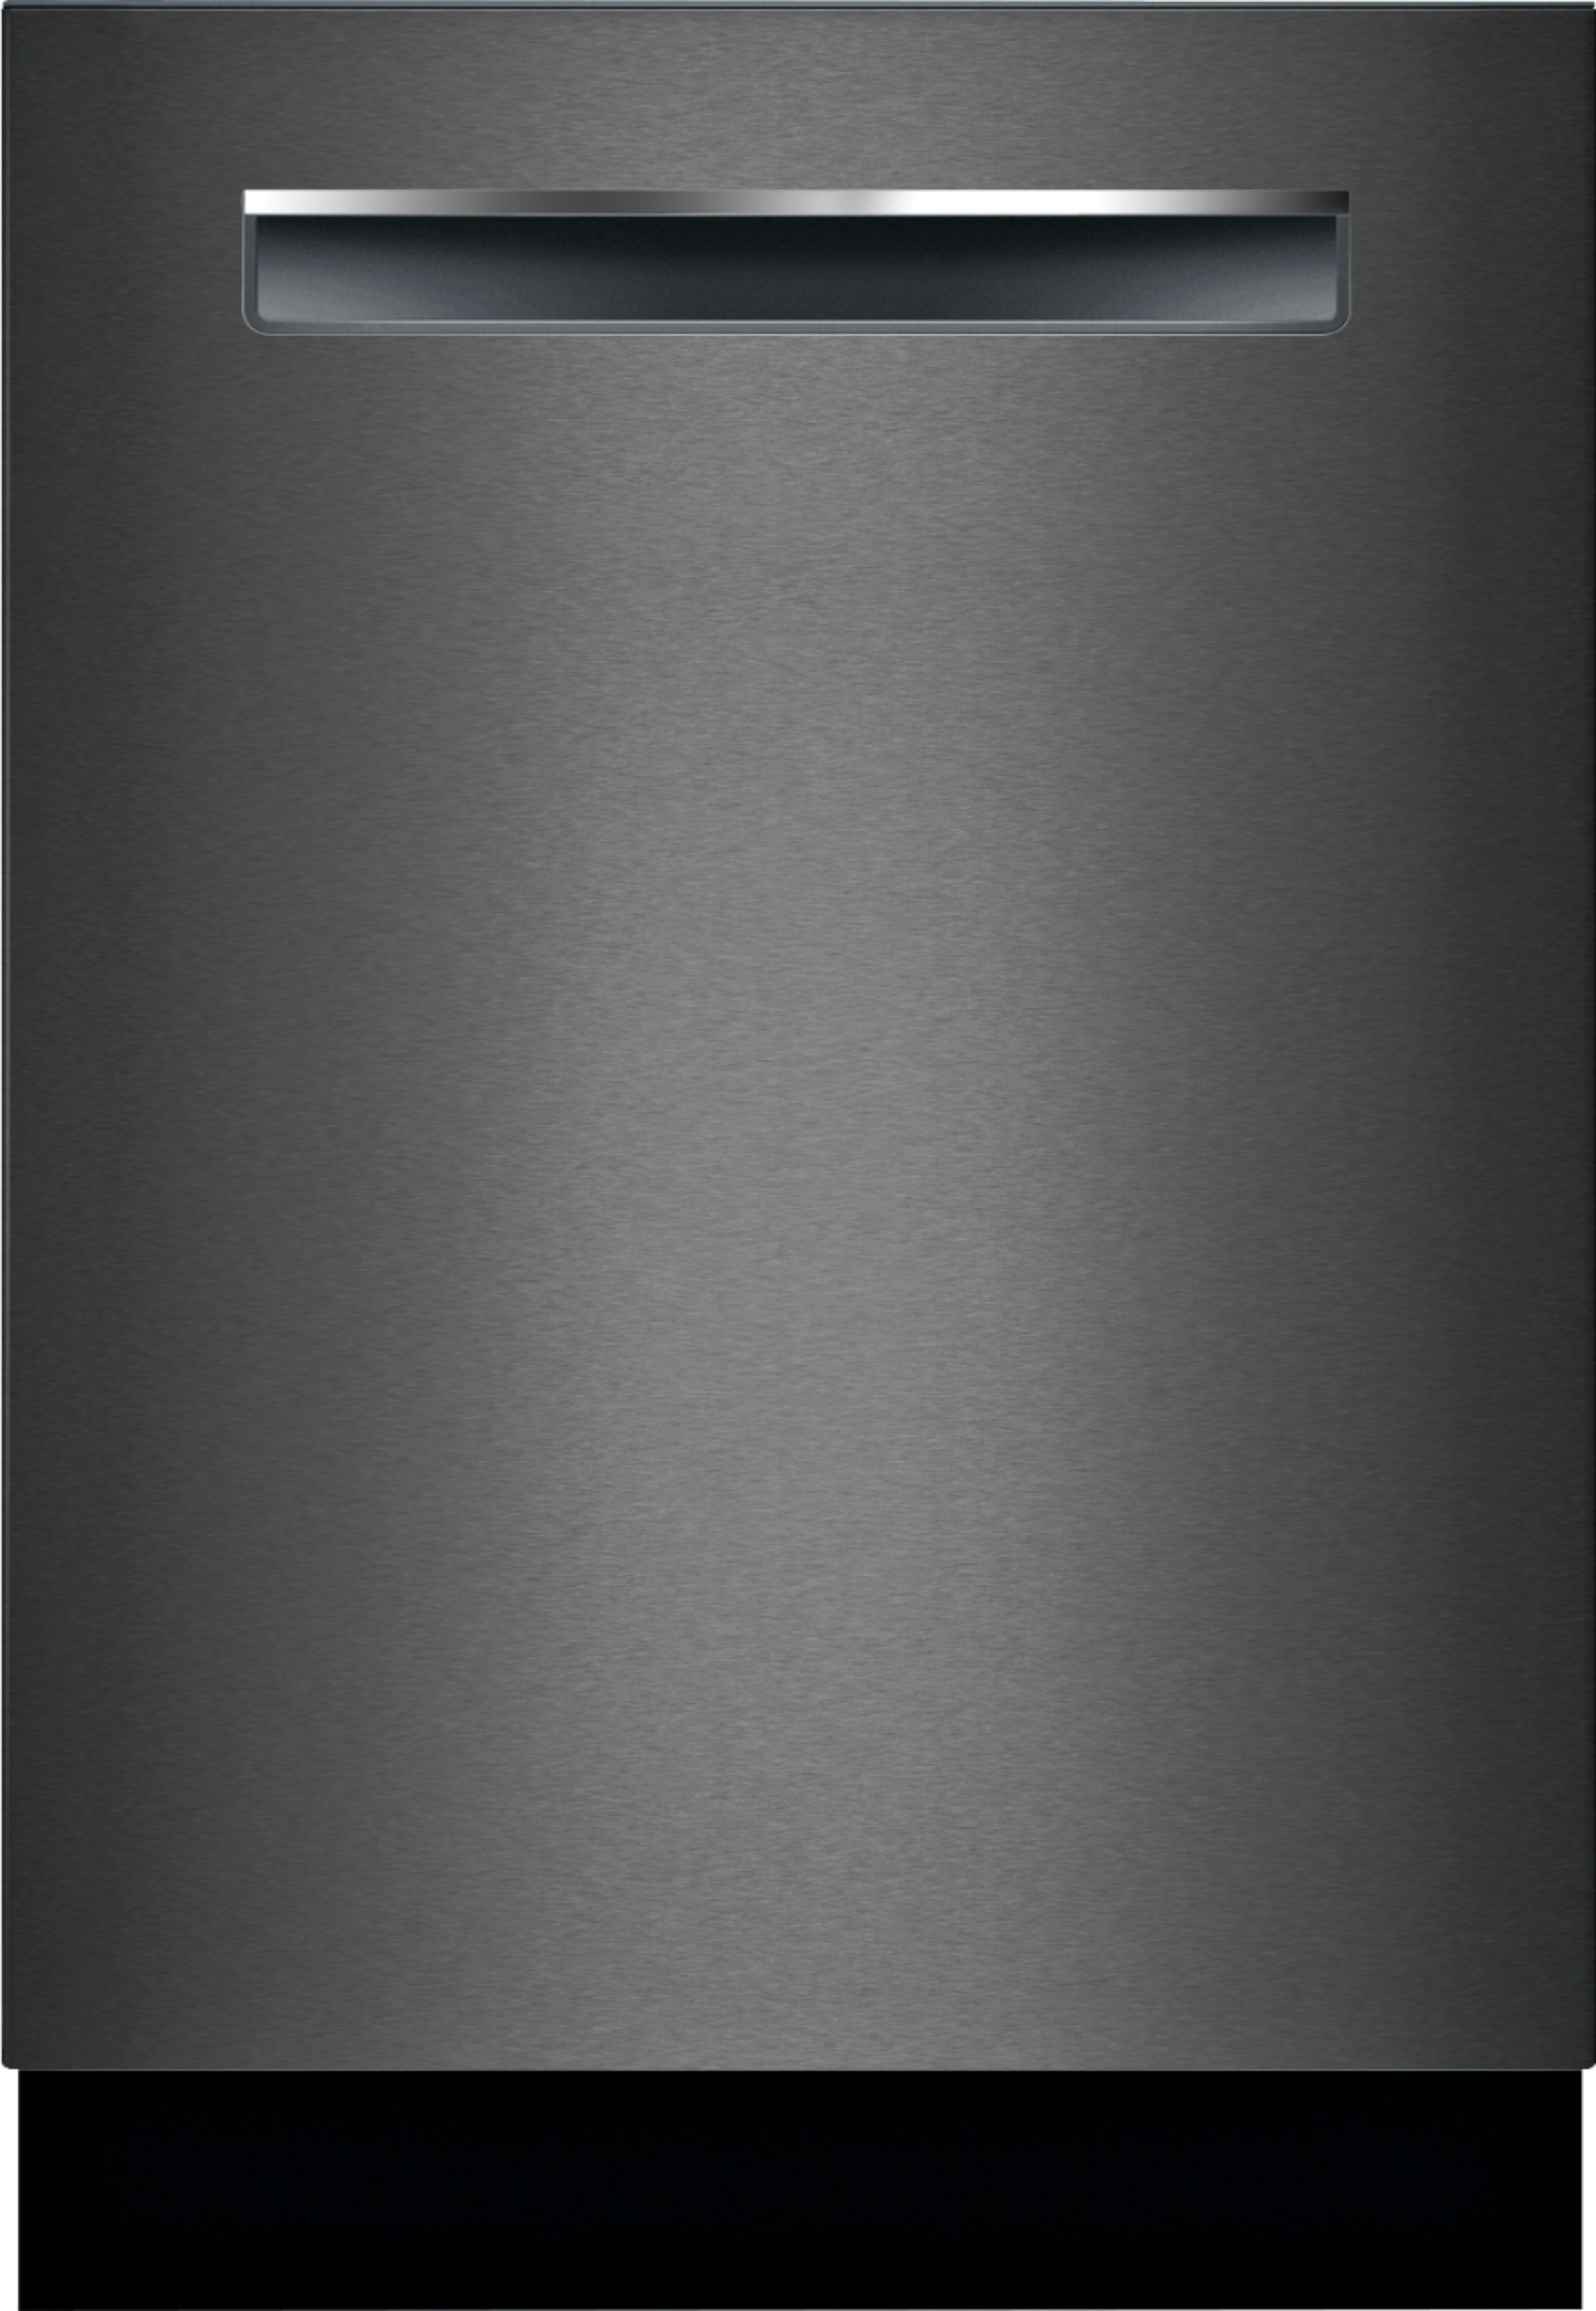 Bosch Dishwasher Top Rack : bosch, dishwasher, Customer, Reviews:, Bosch, Series, Control, Built-In, Dishwasher, CrystalDry,, Stainless, Steel, Rack,, Black, SHPM78Z54N